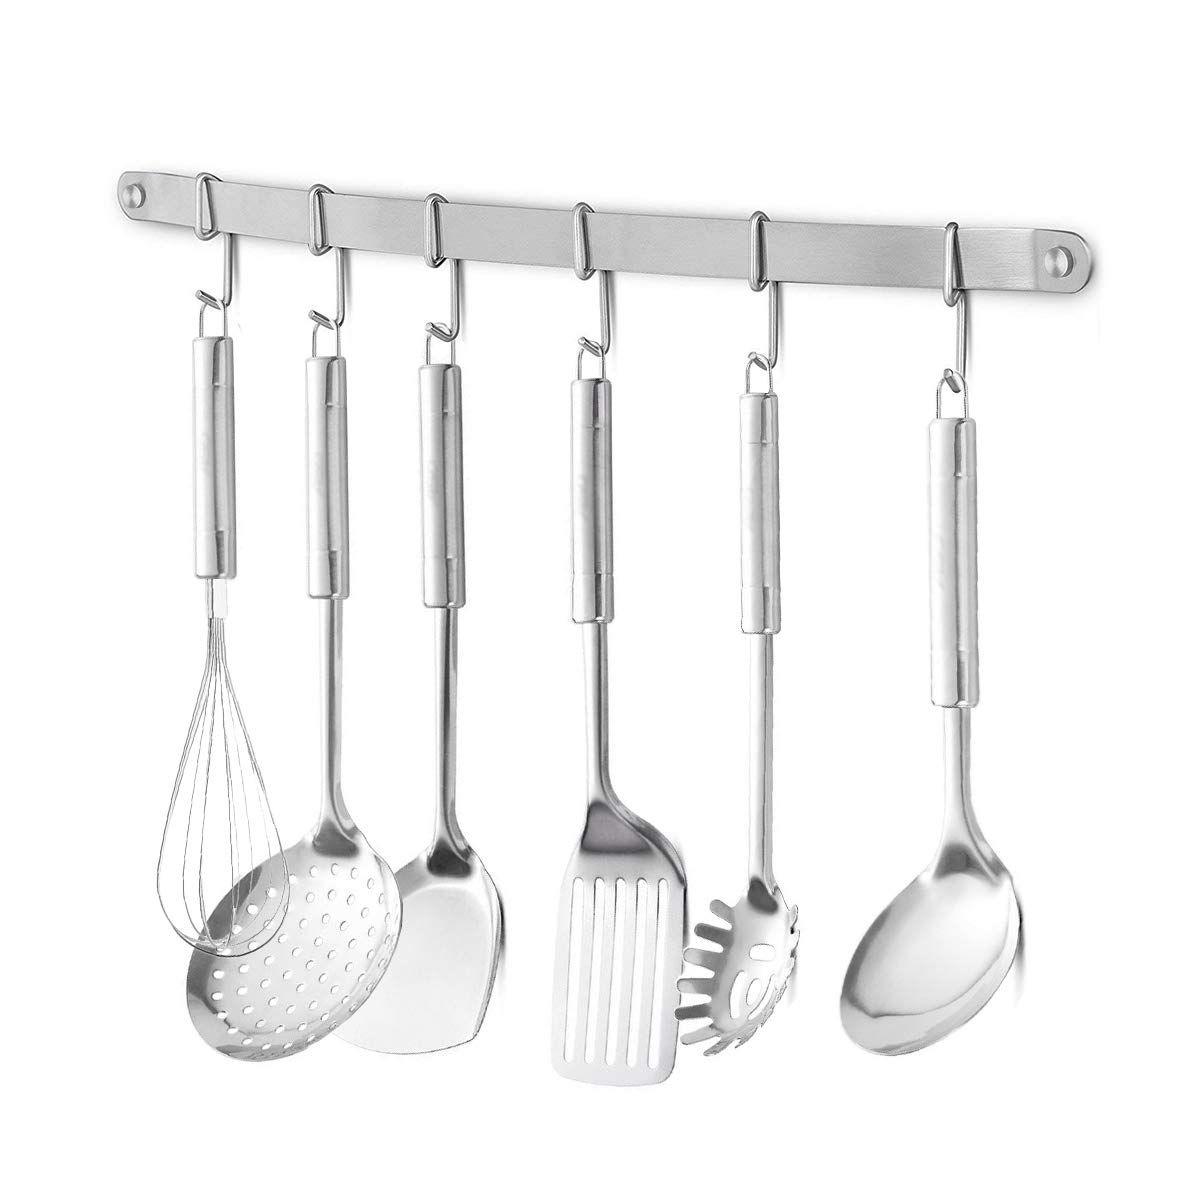 Eforwish Stainless Steel Kitchen Tools Utensil Holder Hanging Rack